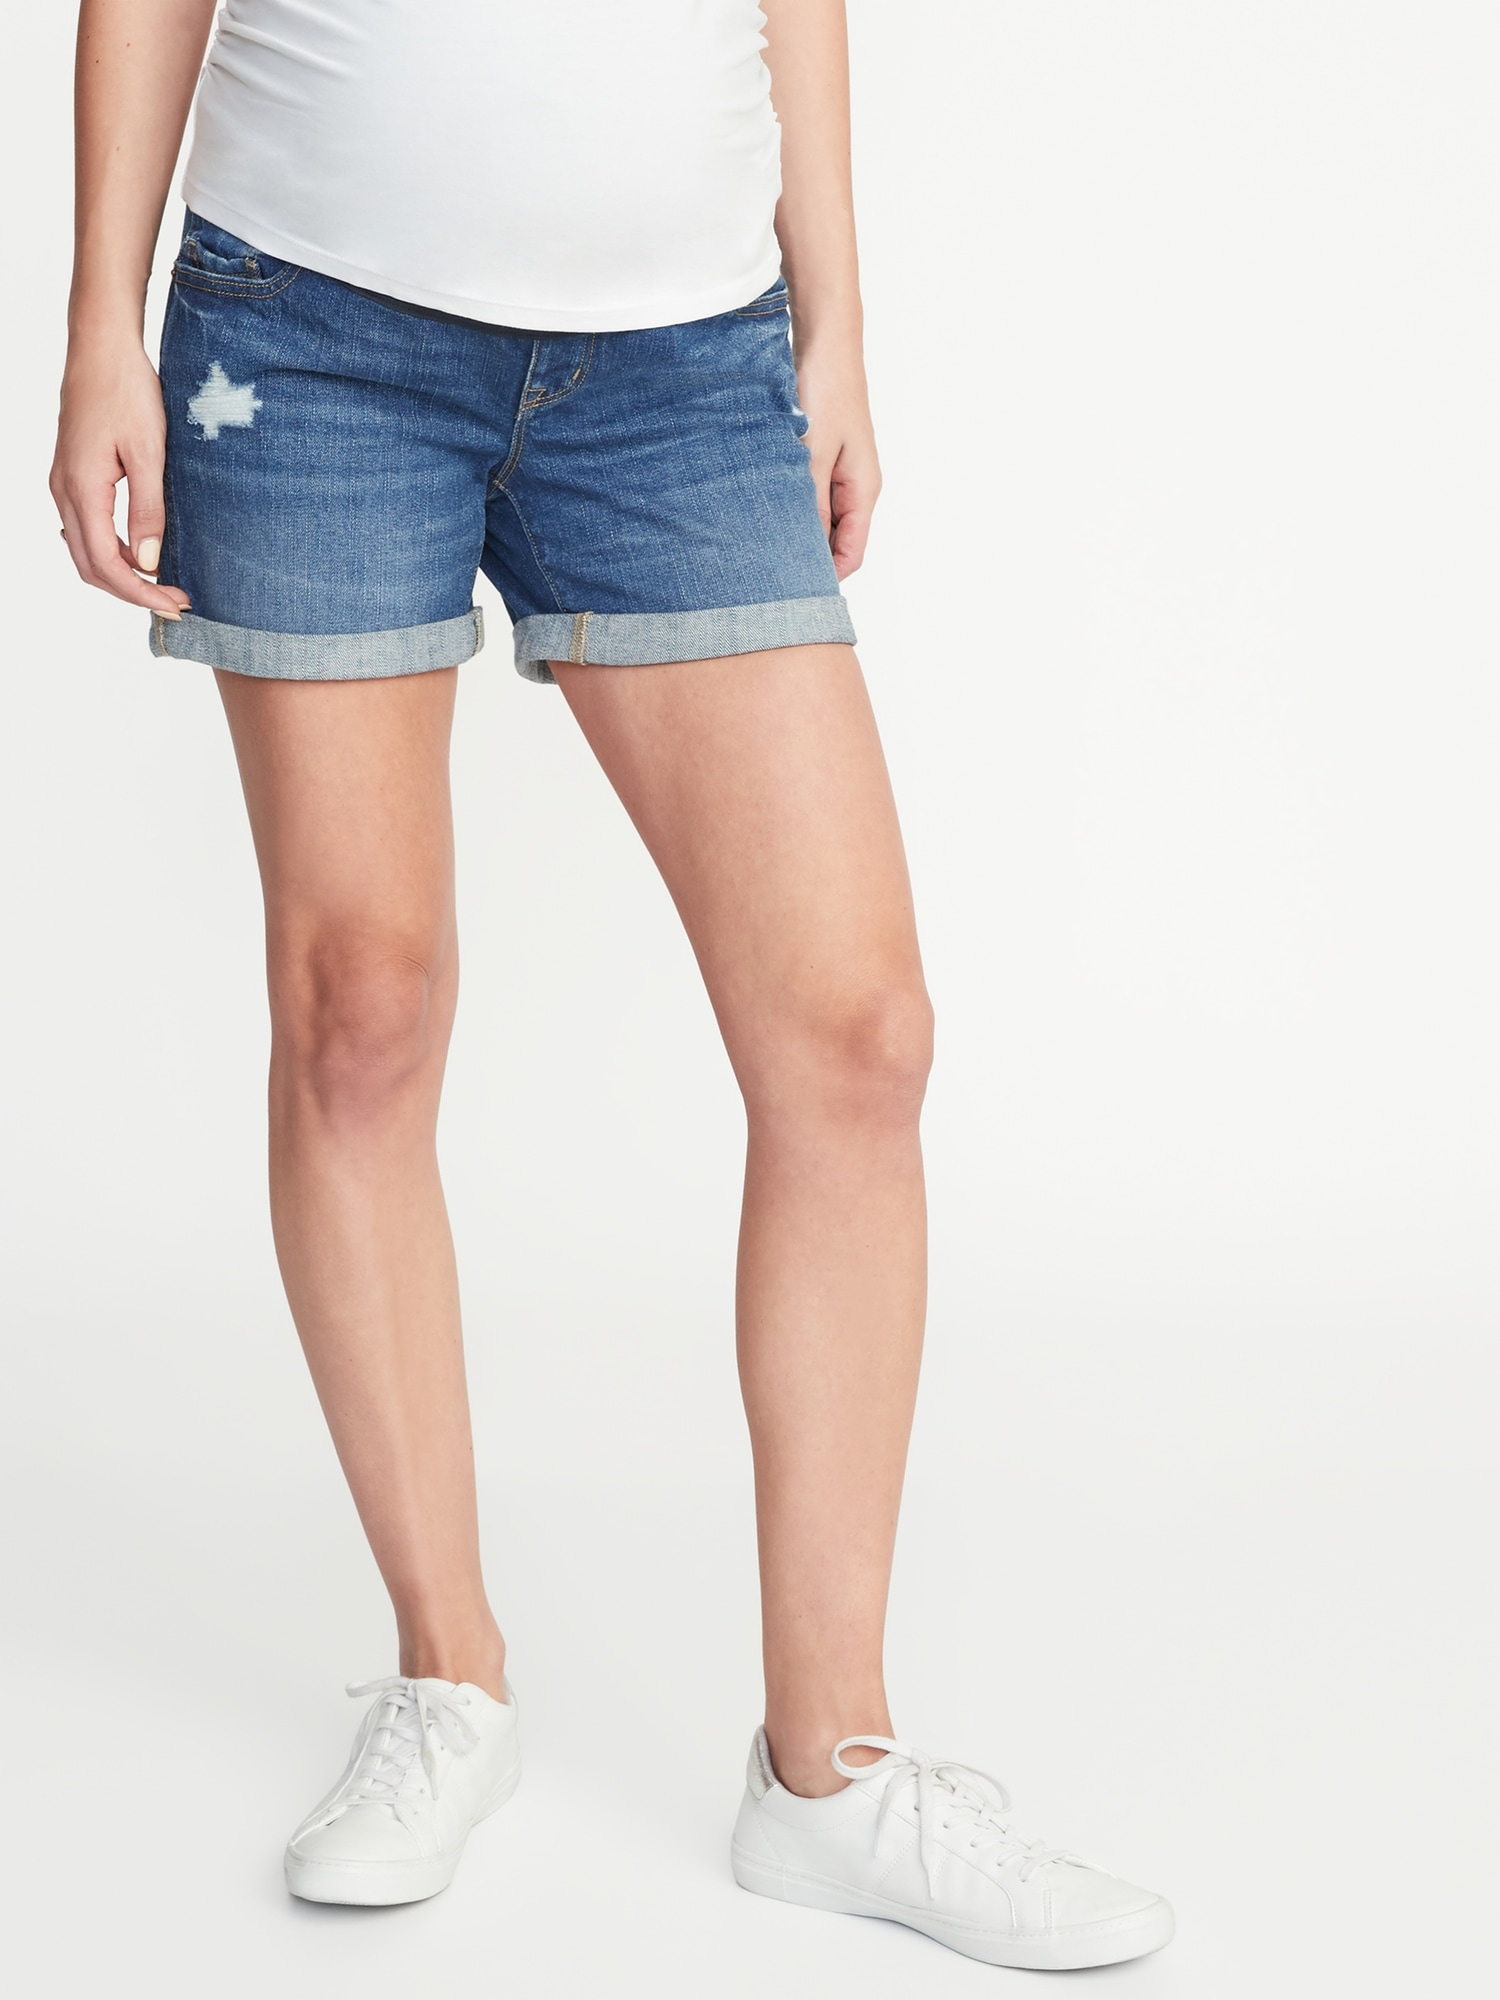 e14f7365d7508 Maternity Full-Panel Distressed Denim Boyfriend Shorts - 5-inch inseam